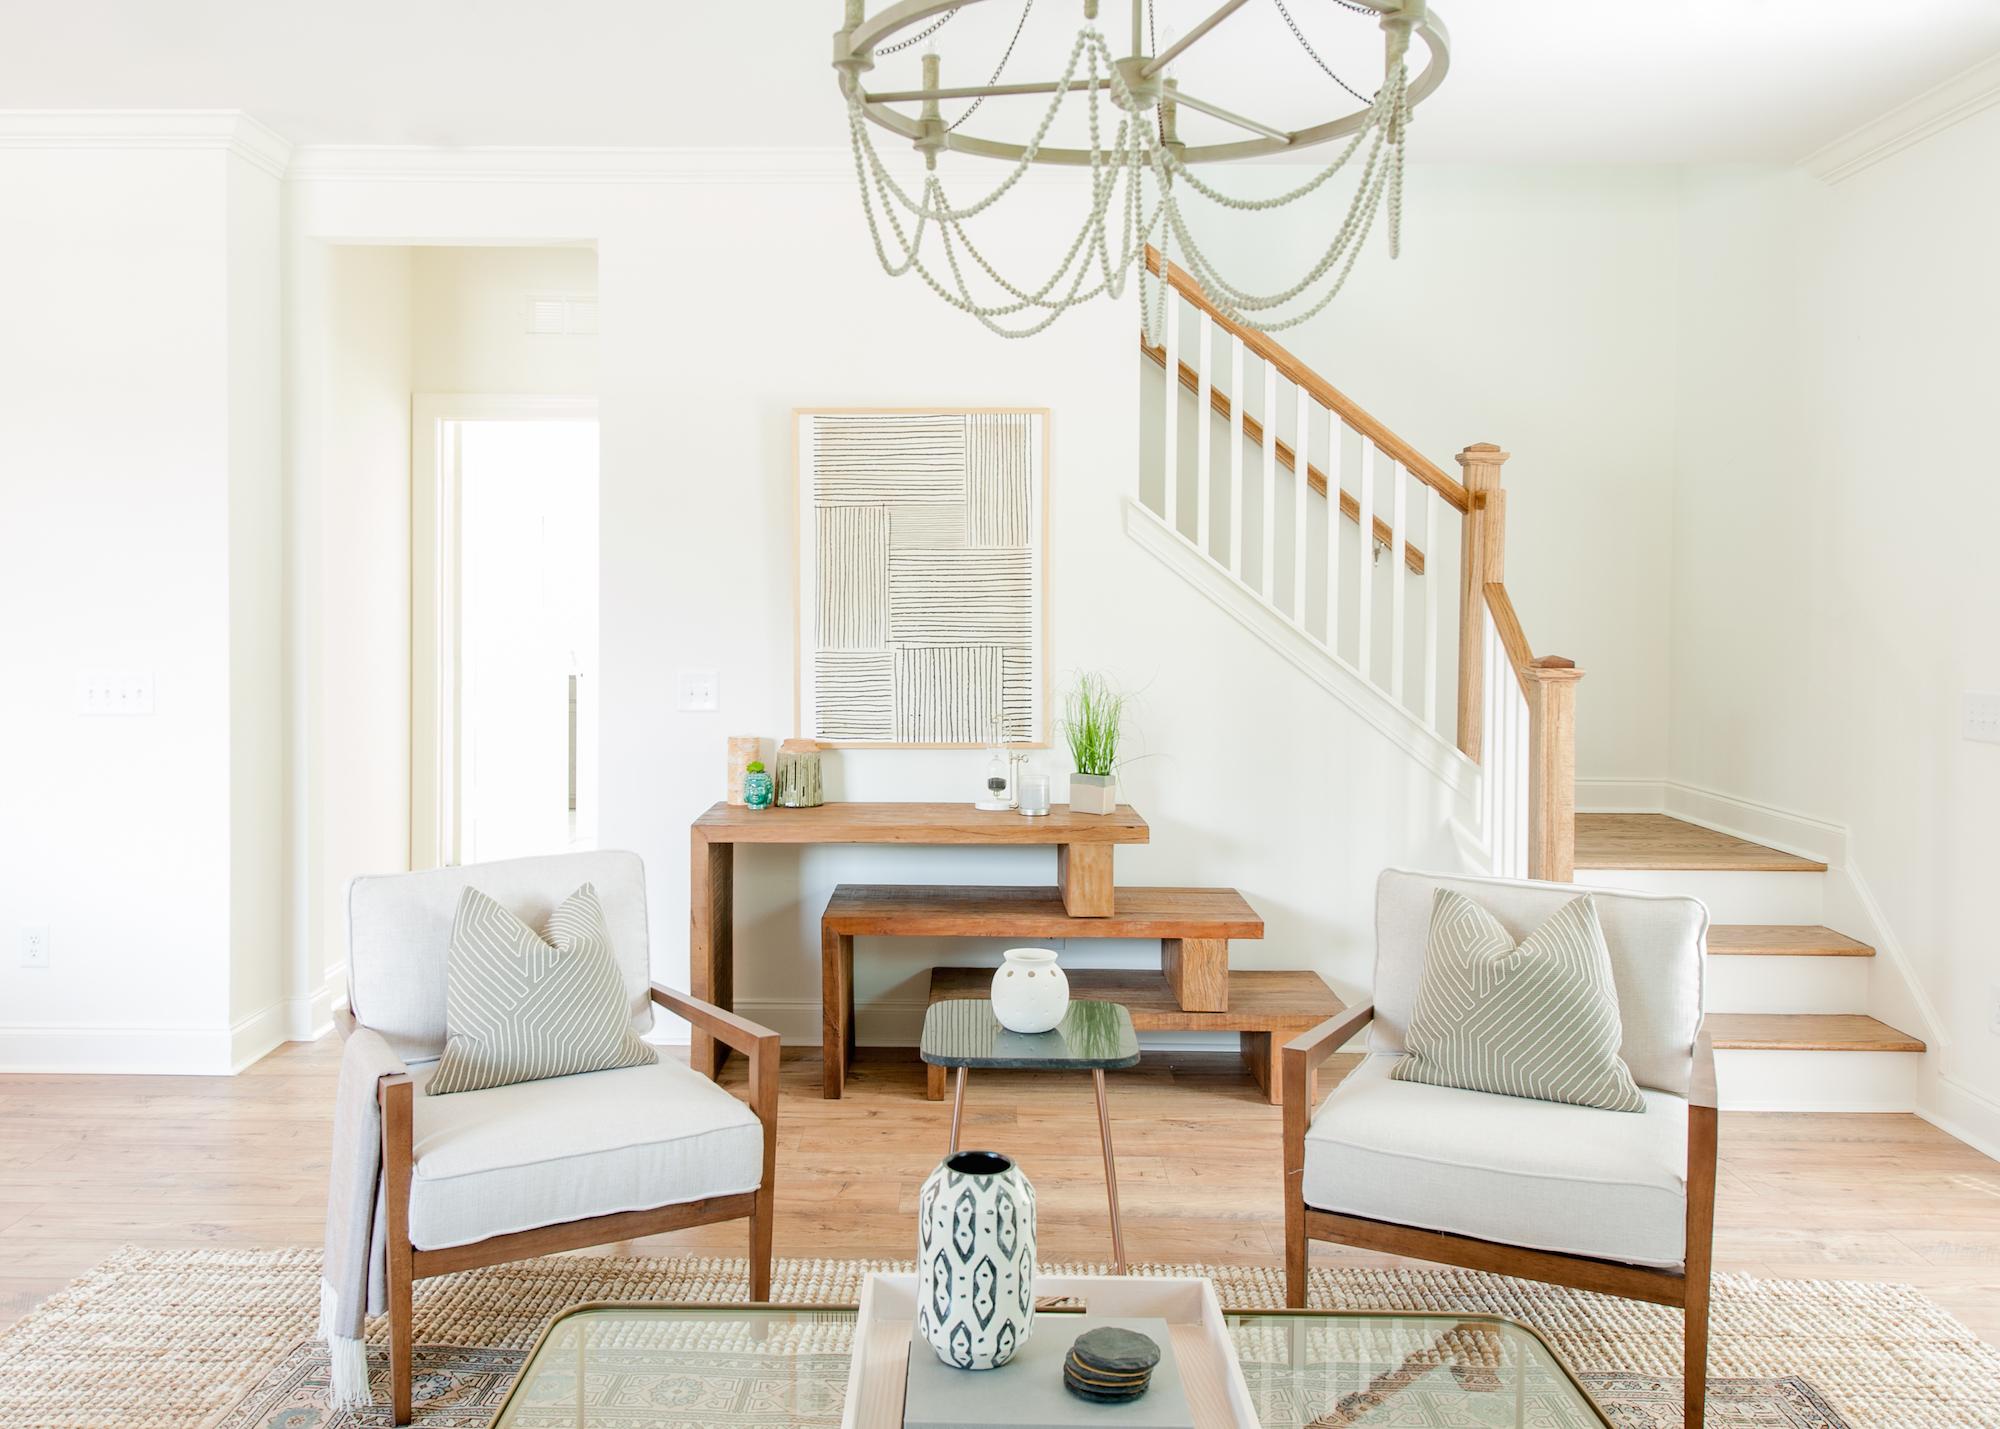 Introducing Highland Park in Summerville, SC | Blog | Crescent Homes